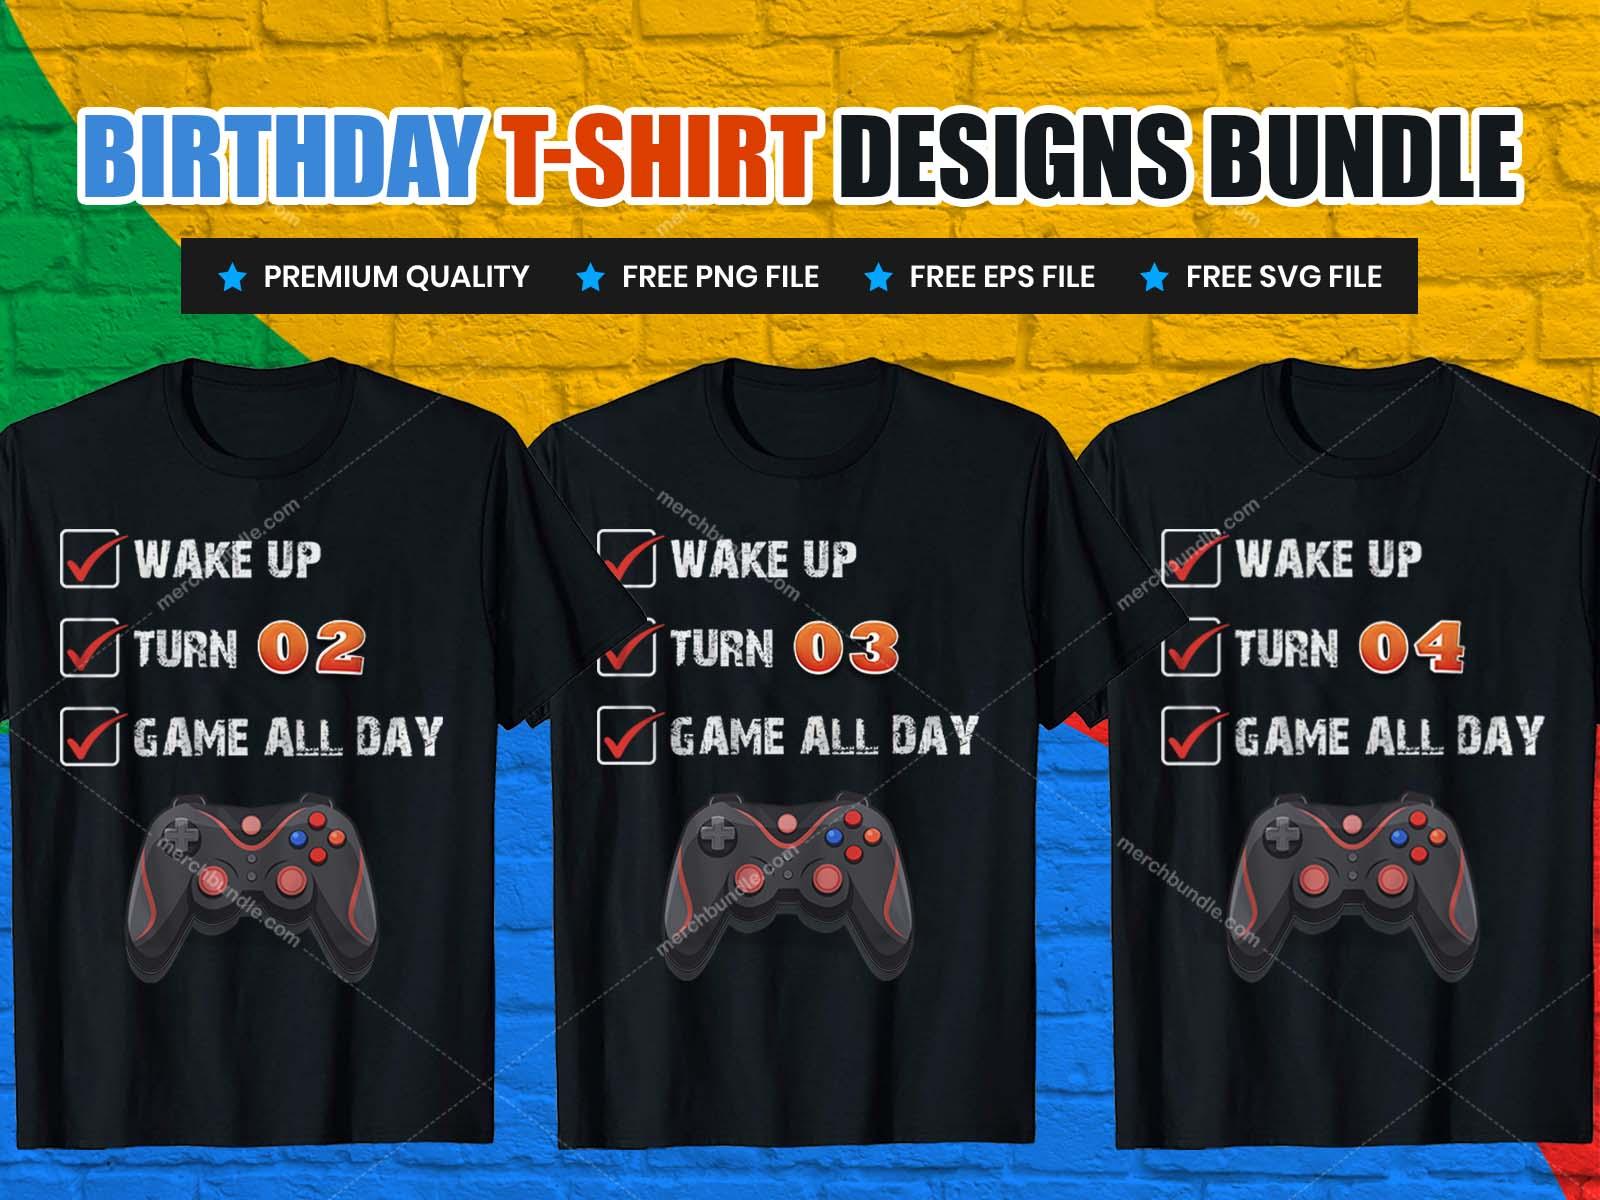 Gamer On Happy Birthday T-Shirt Designs